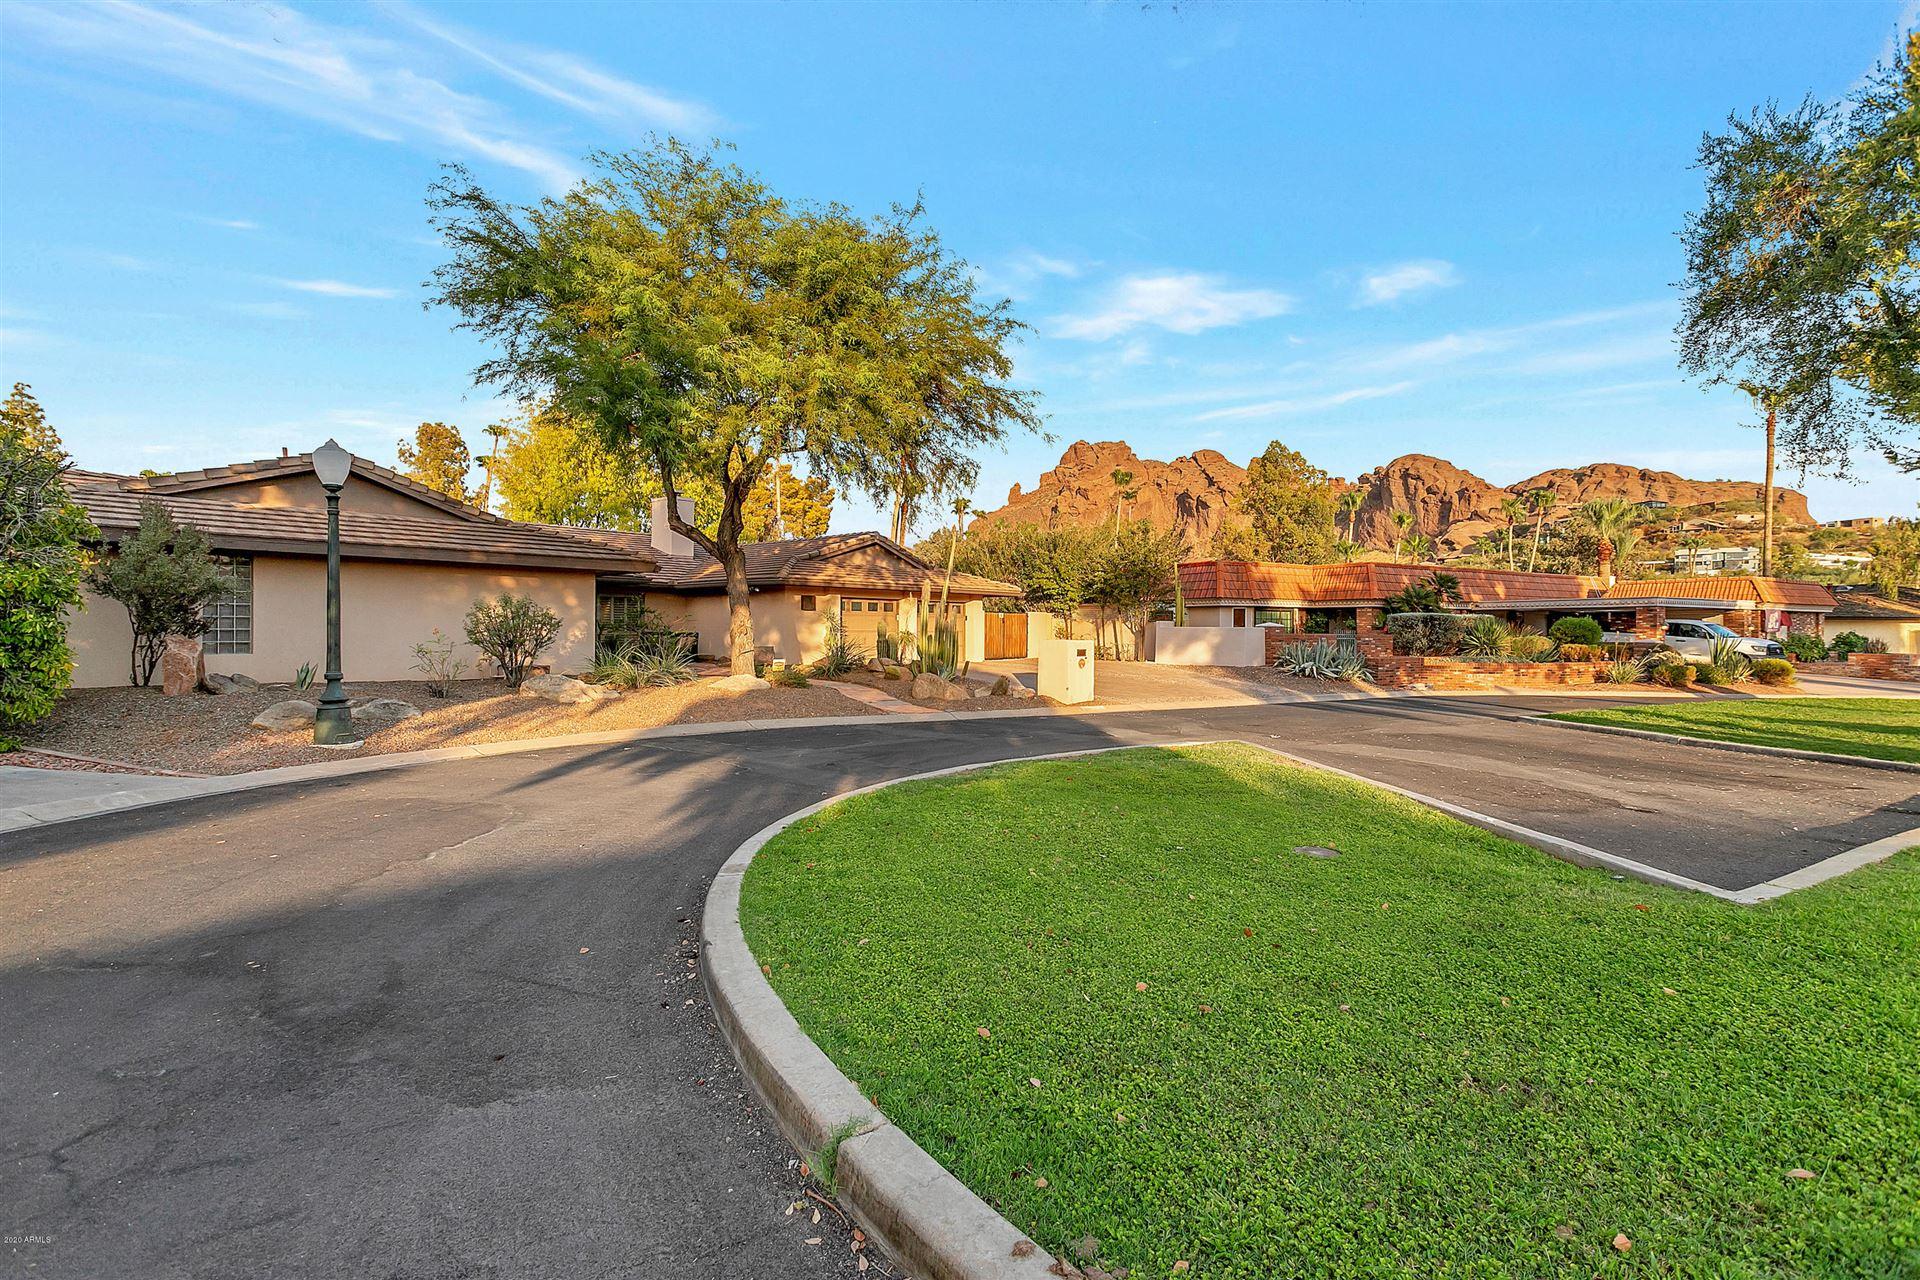 5919 N 45TH Street, Phoenix, AZ 85018 - MLS#: 6118725